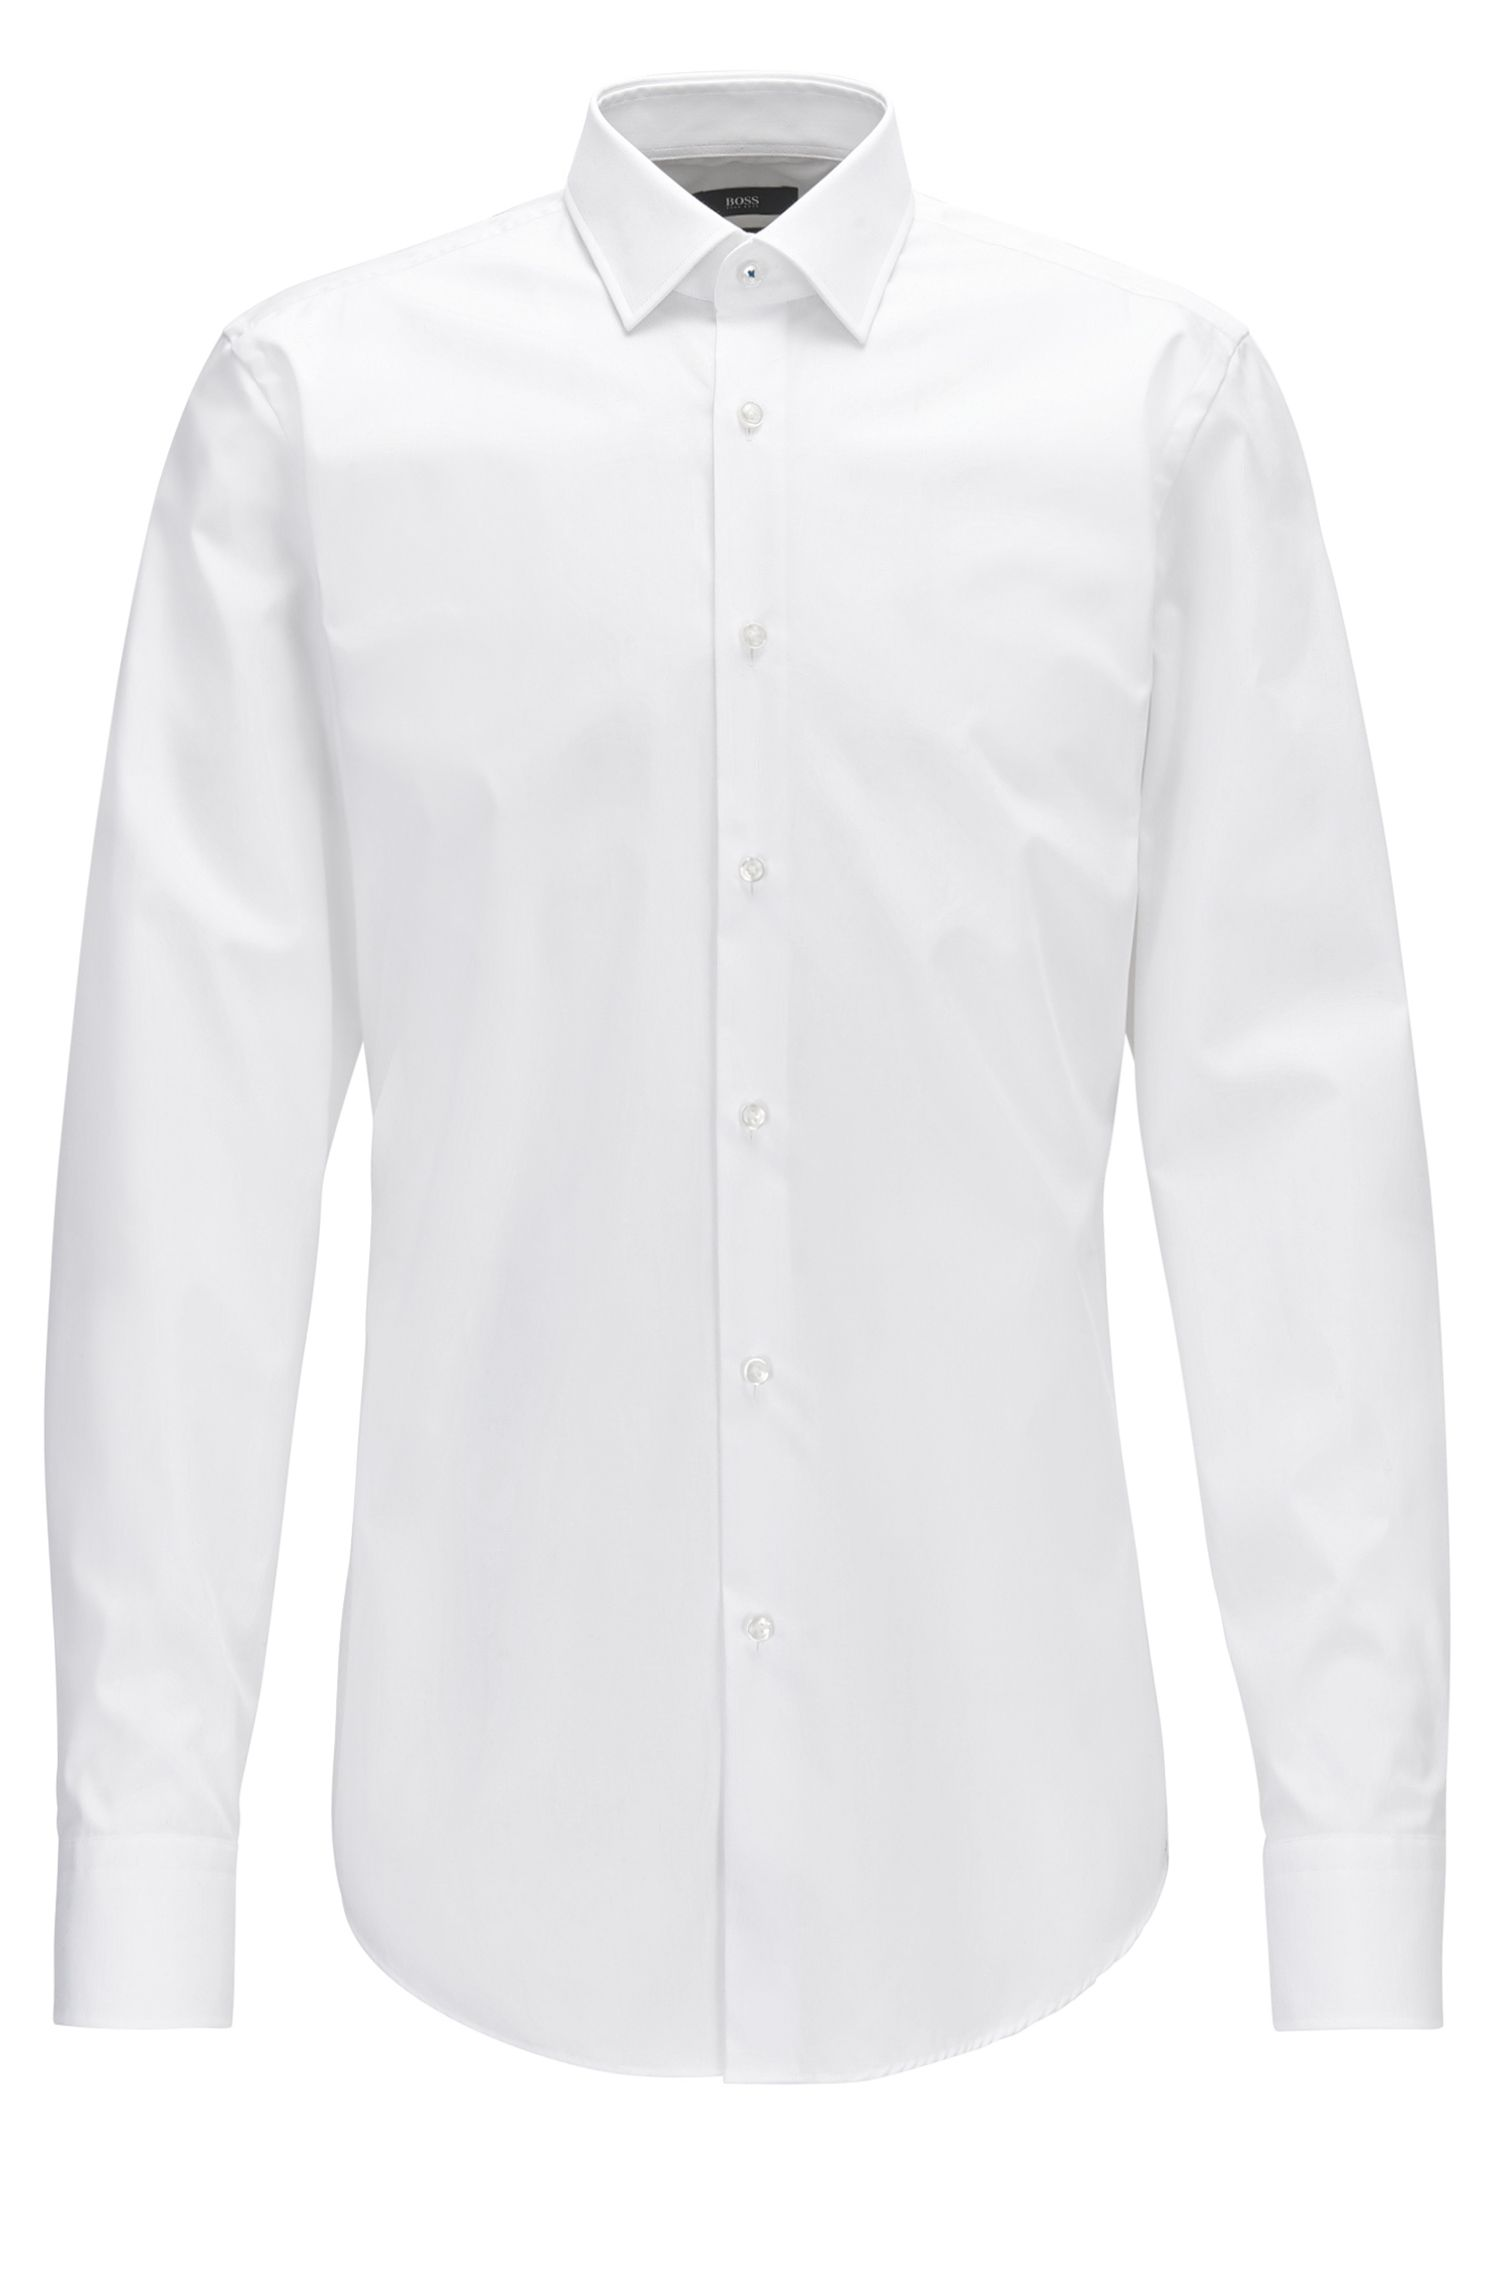 Easy-Iron Cotton Dress Shirt, Slim Fit | Jerris, White